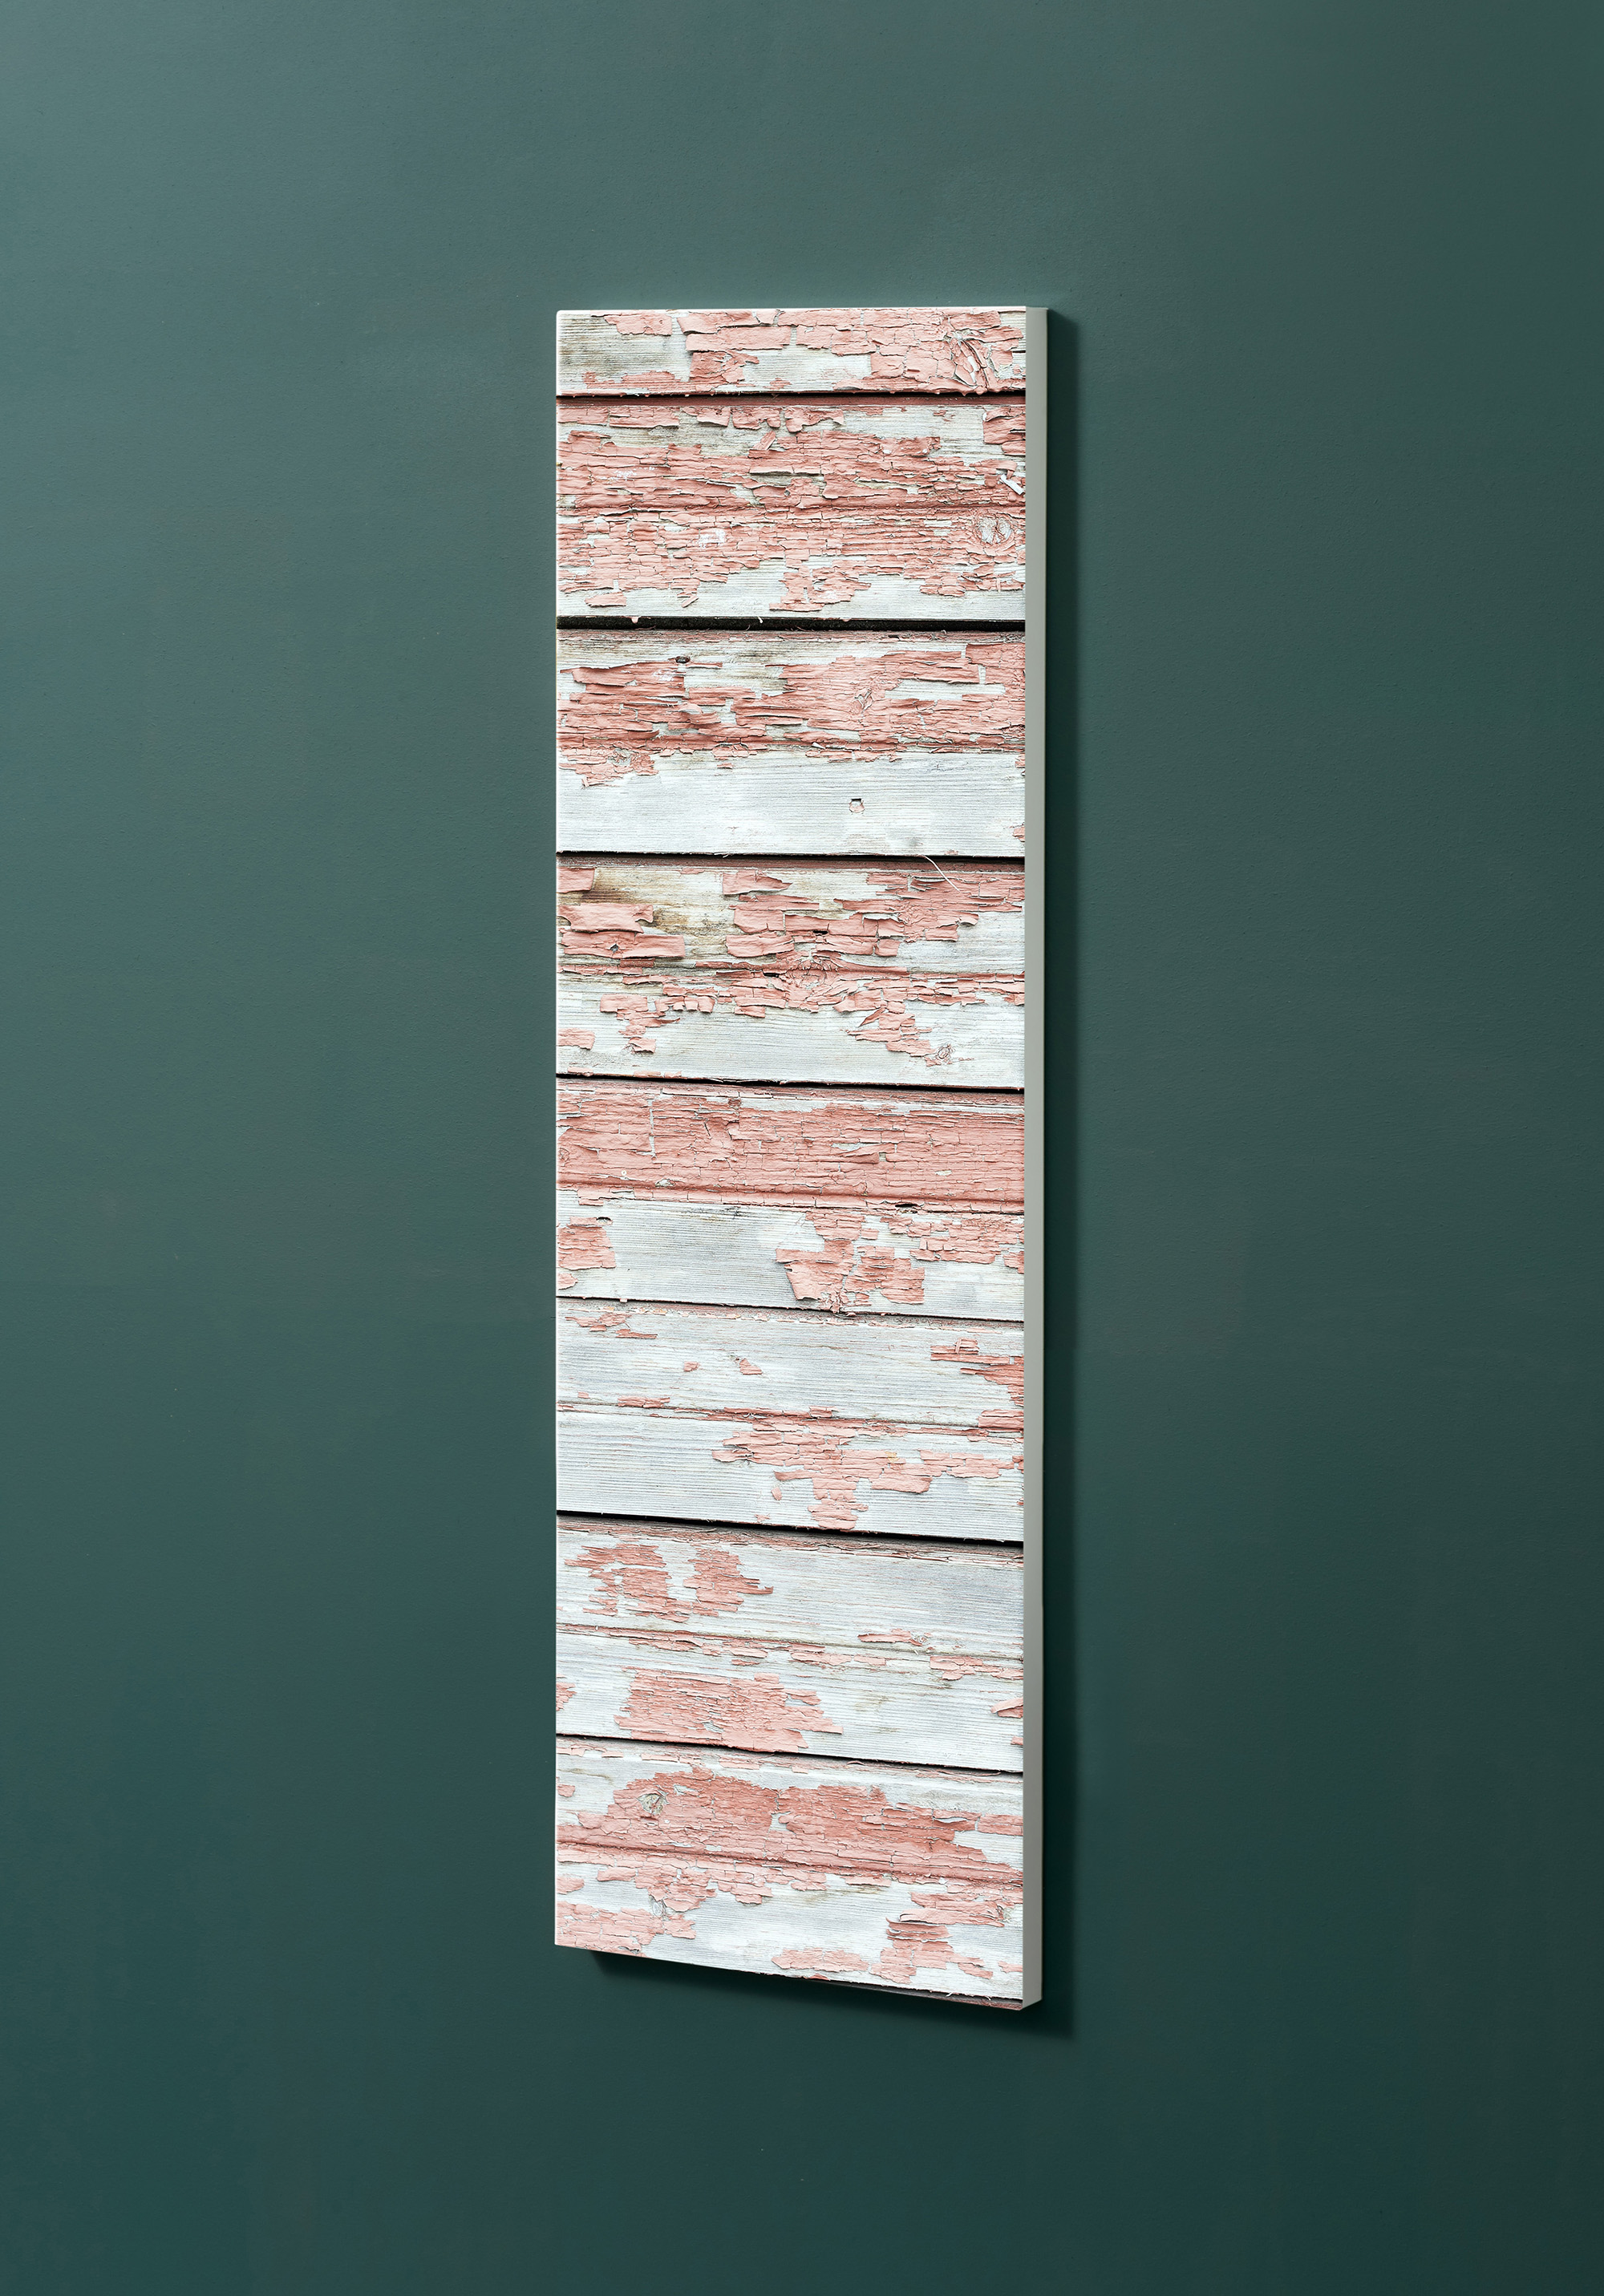 Magnettafel NOTIZ 30x90cm Motiv-Pinnwand M28 Holzbretter Vintage